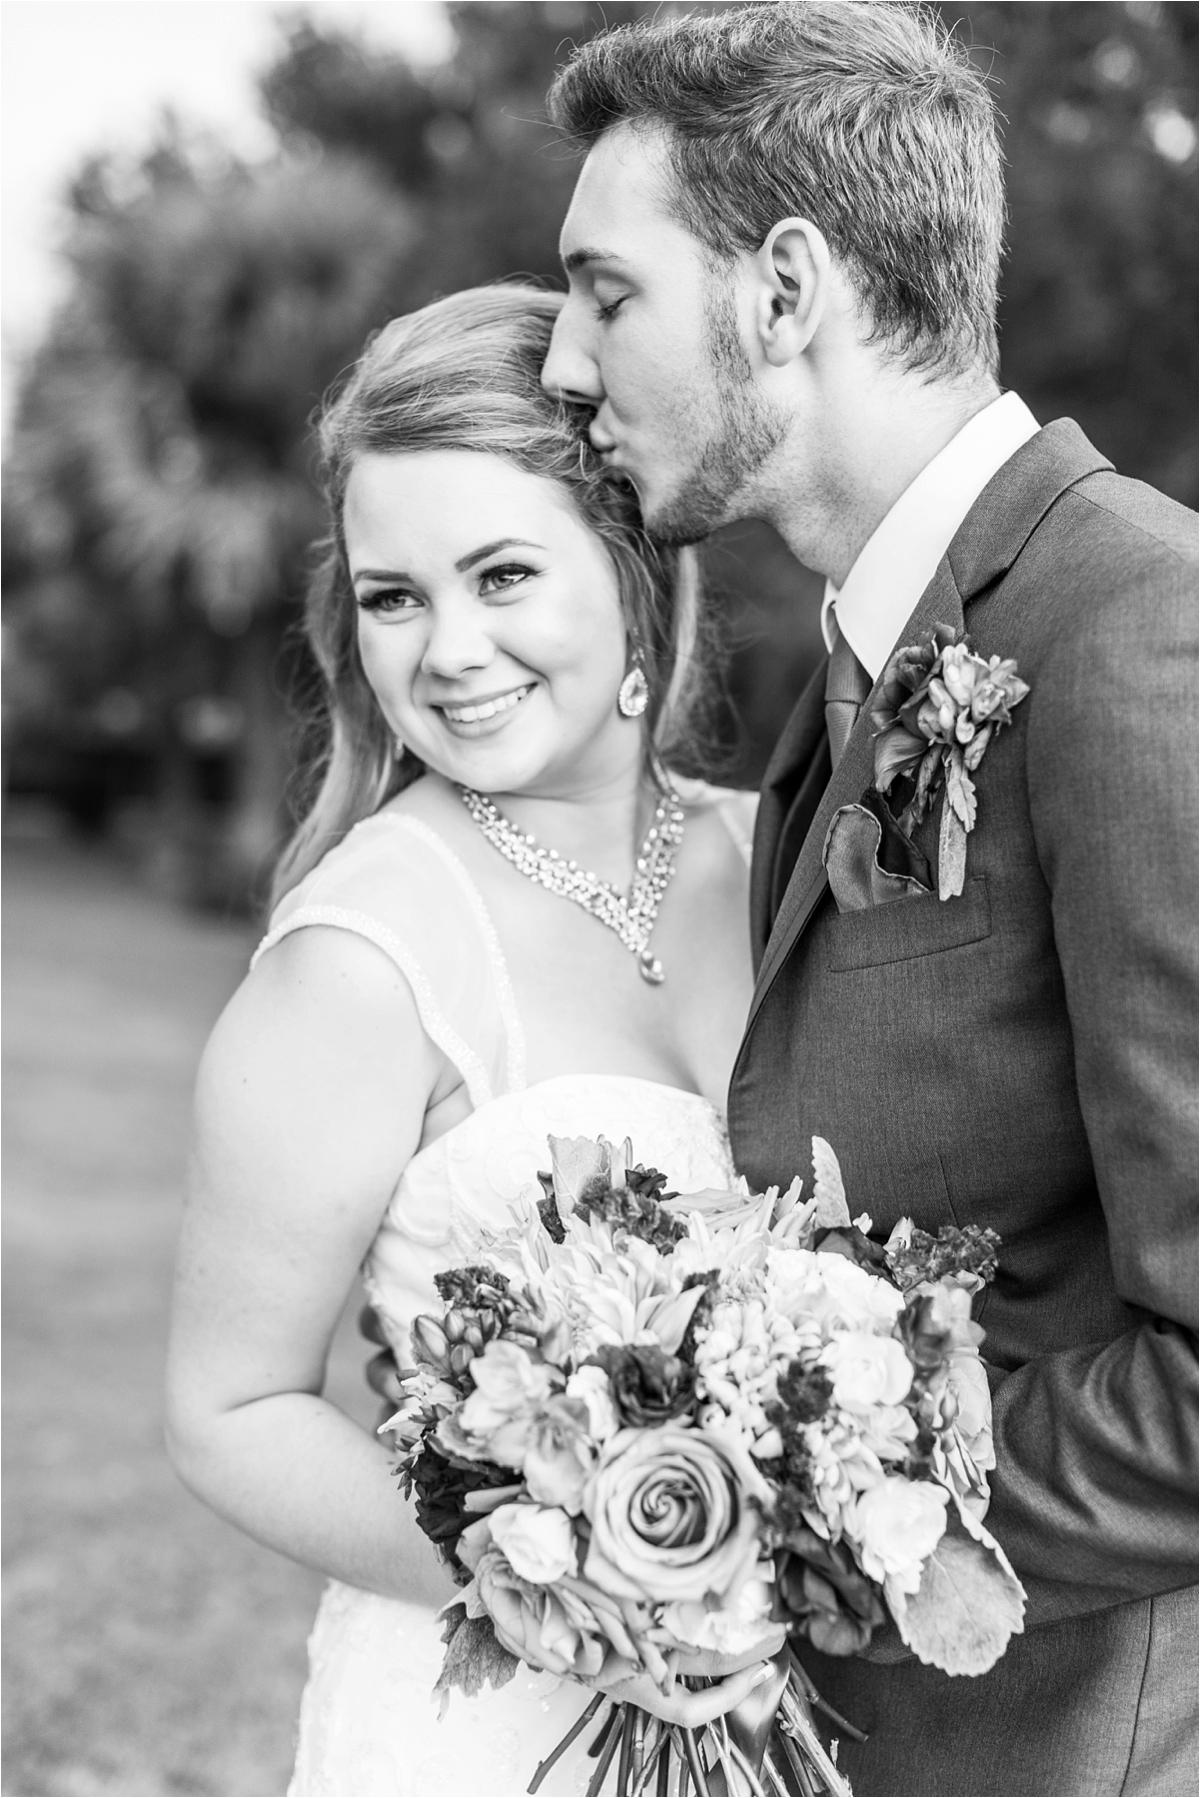 bride-groom-portraits-photos-chunky-jewelry-large-bridal